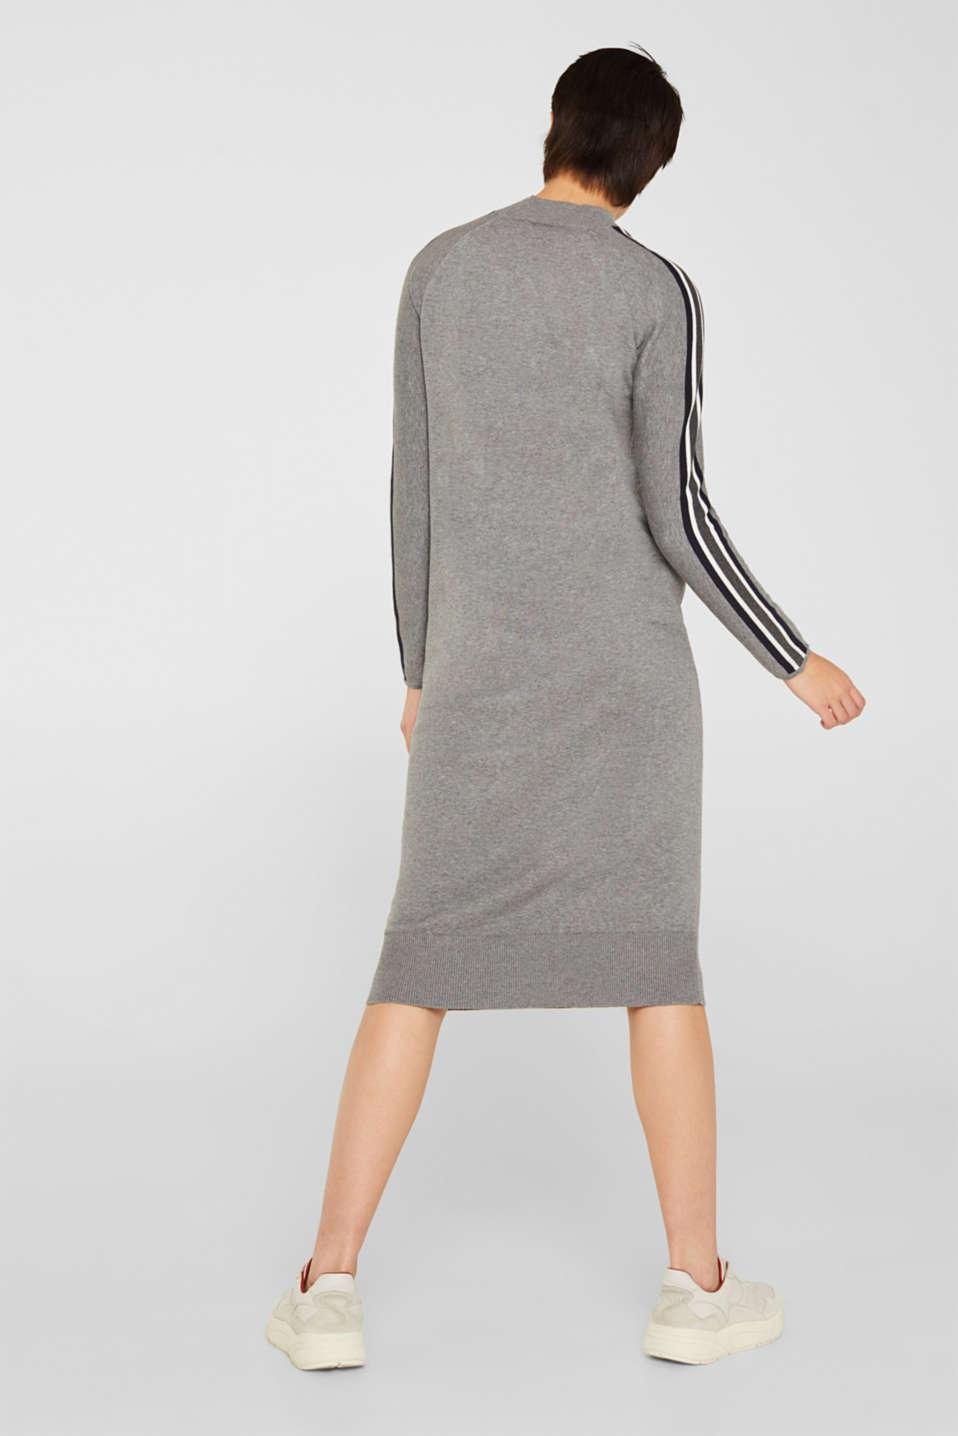 Dresses flat knitted, GUNMETAL 5, detail image number 2